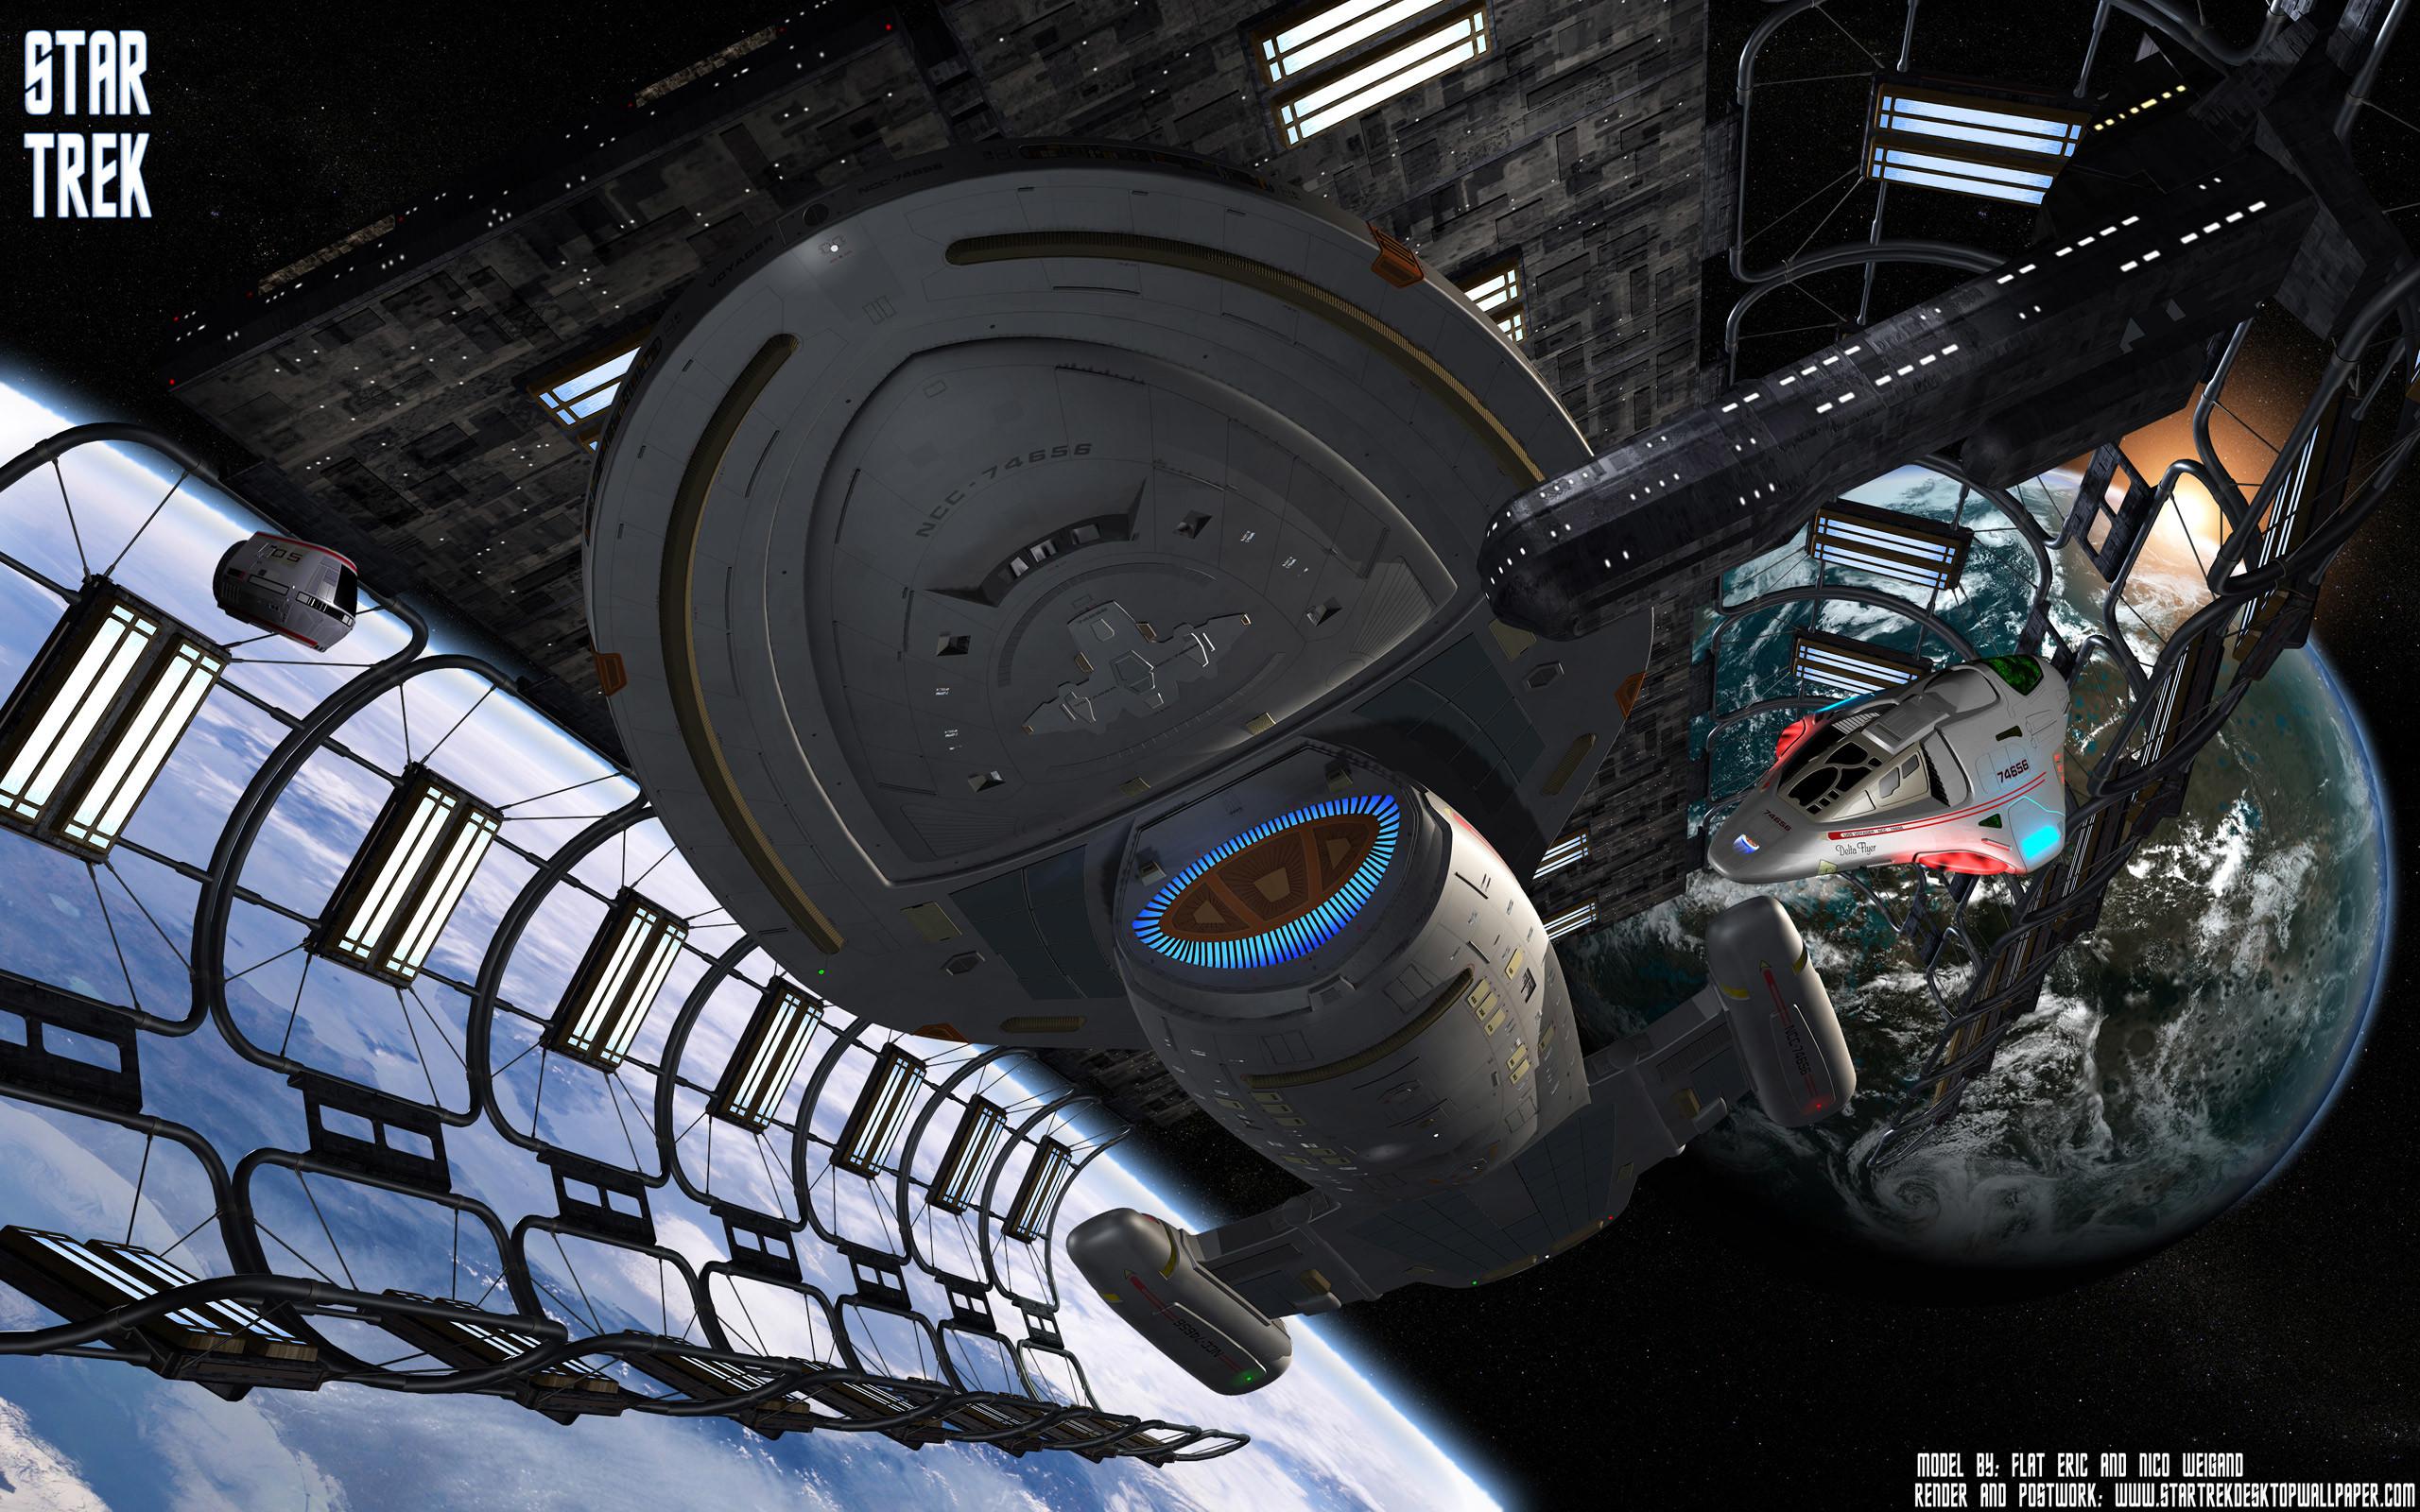 Star Trek USS Voyager NCC 74656 In DryDock, free Star Trek .